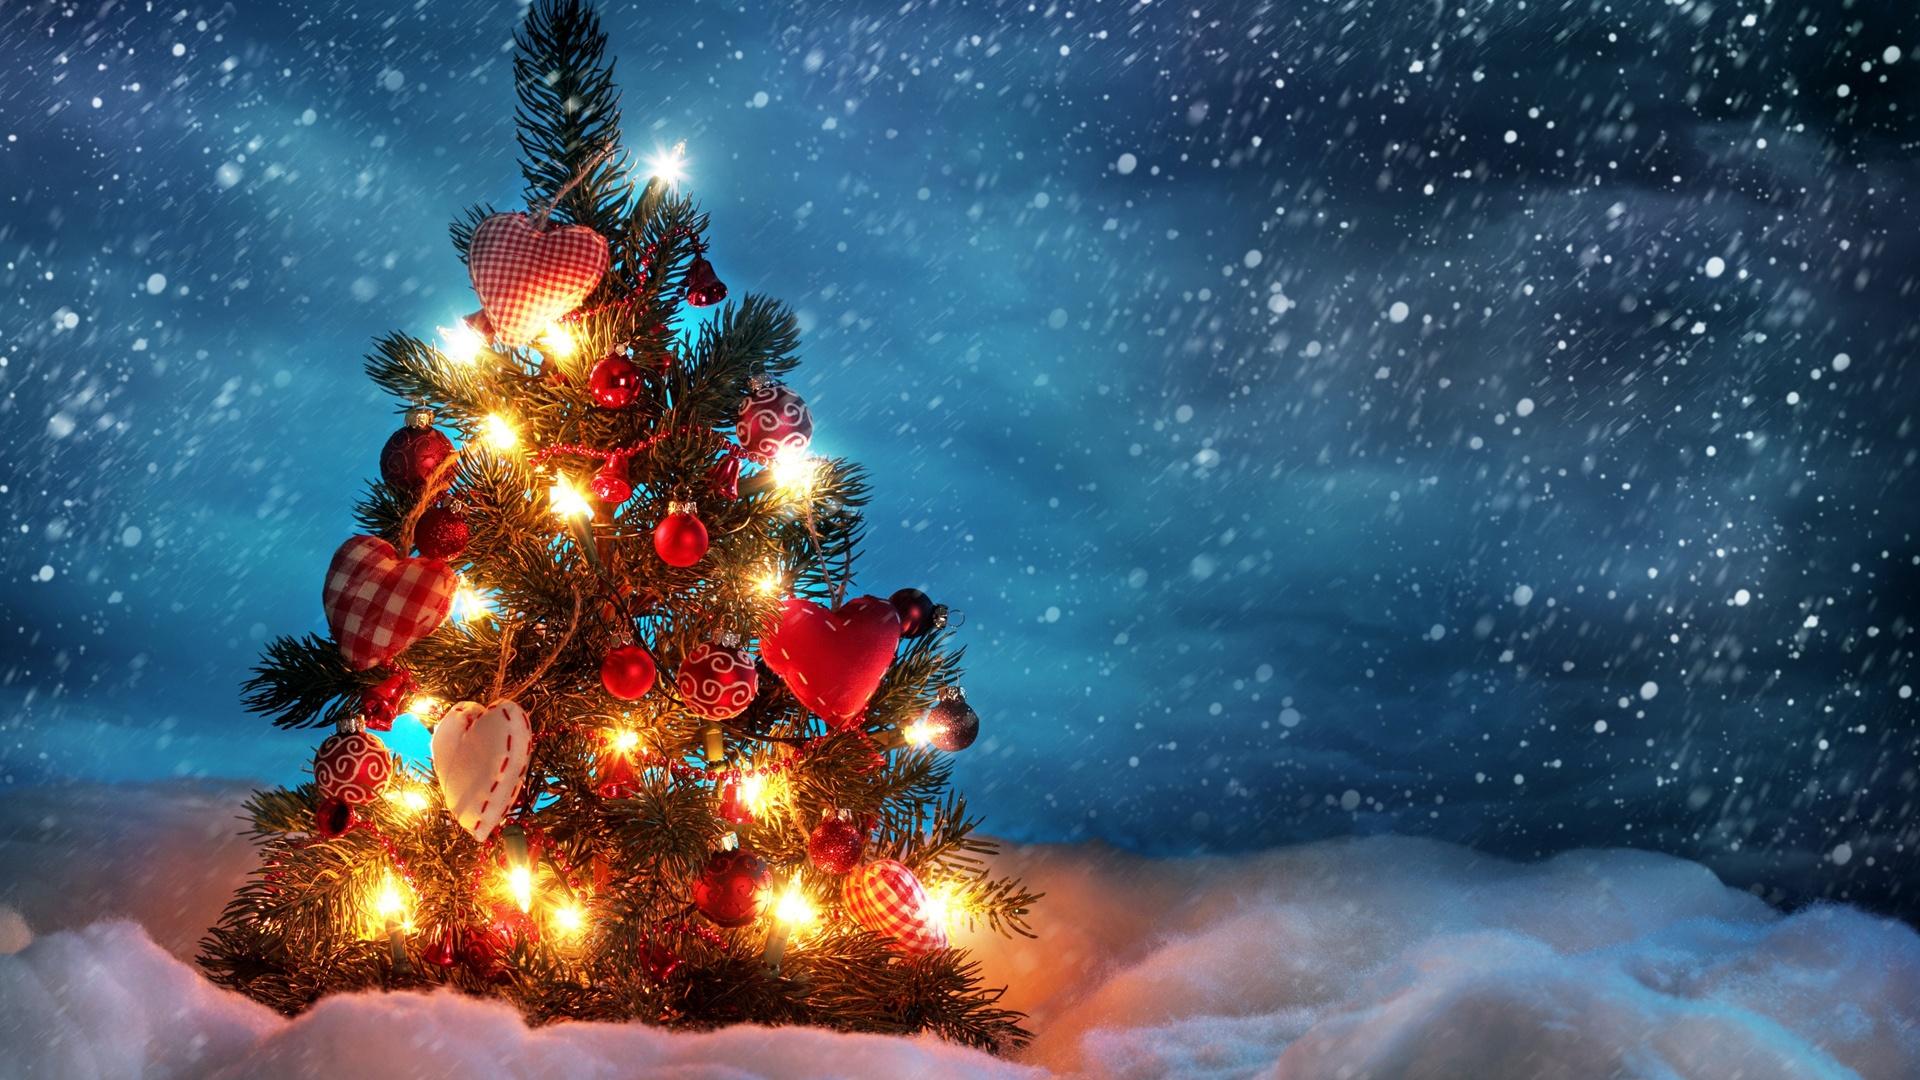 Wallpaper Christmas HD Free Download